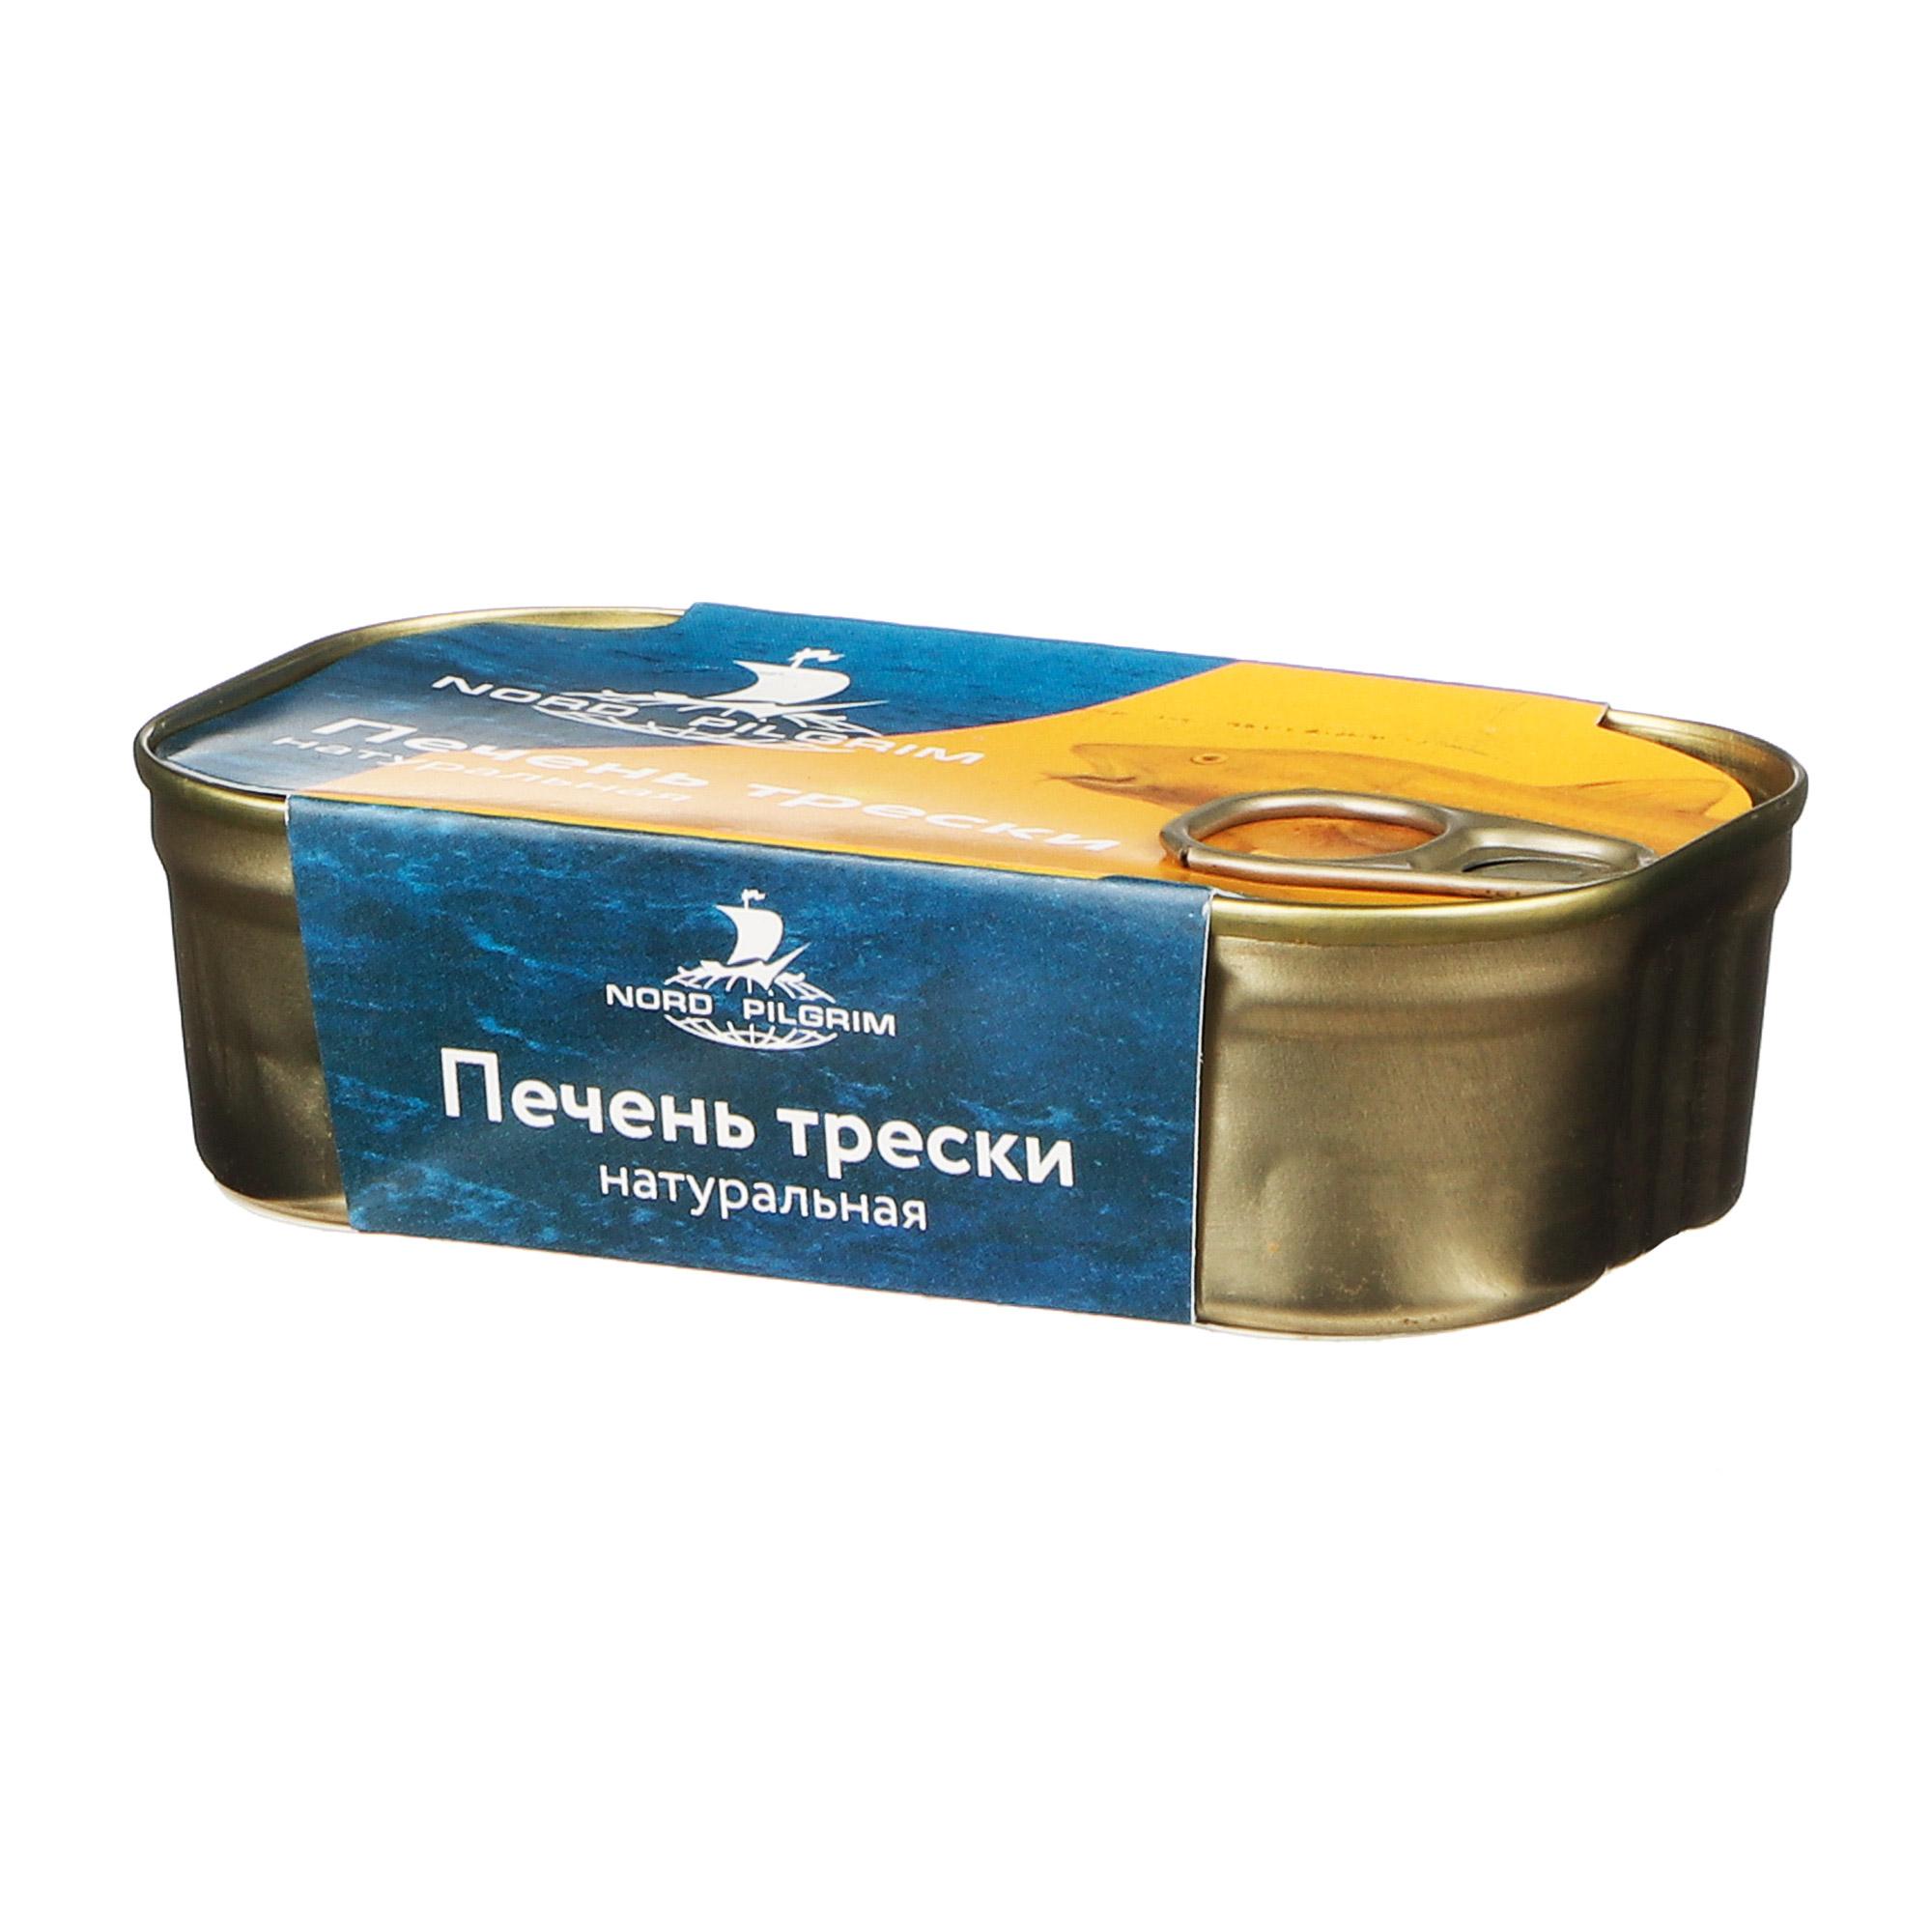 Печень трески Nord Pilgrim натуральная 115 г набор city pilgrim серый